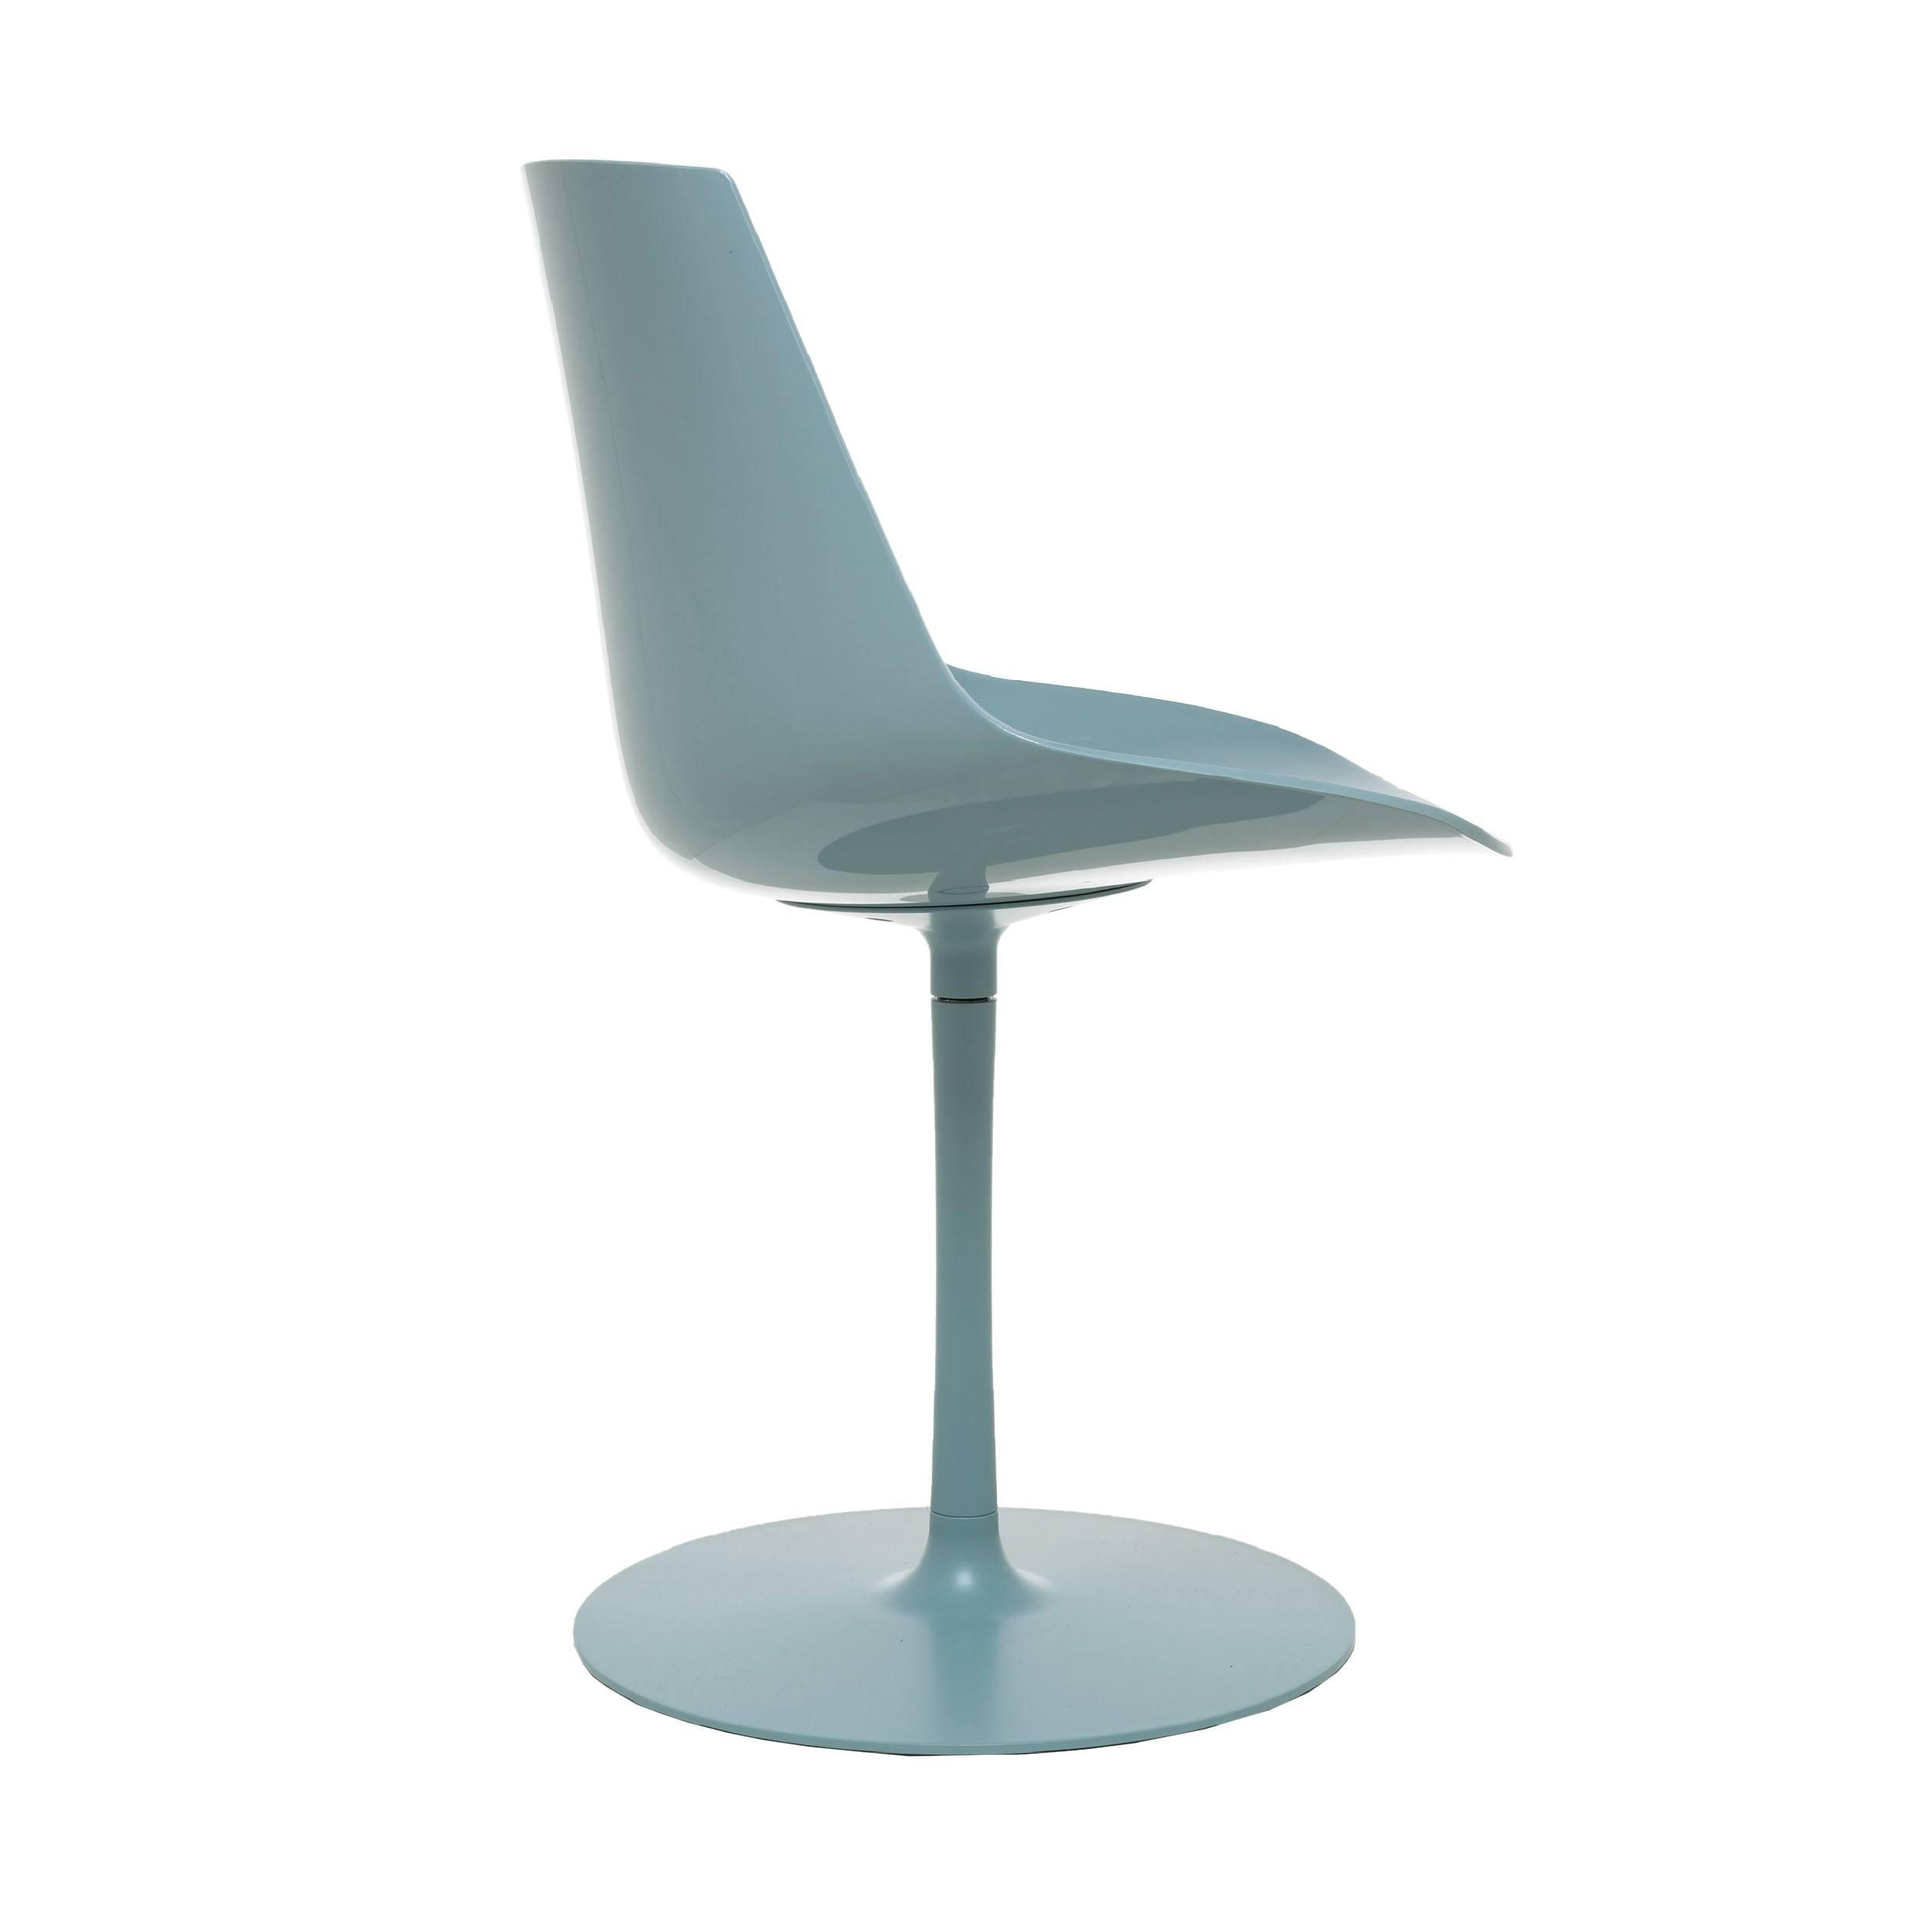 Flow Glossy Stuhl mit Tellerfuß